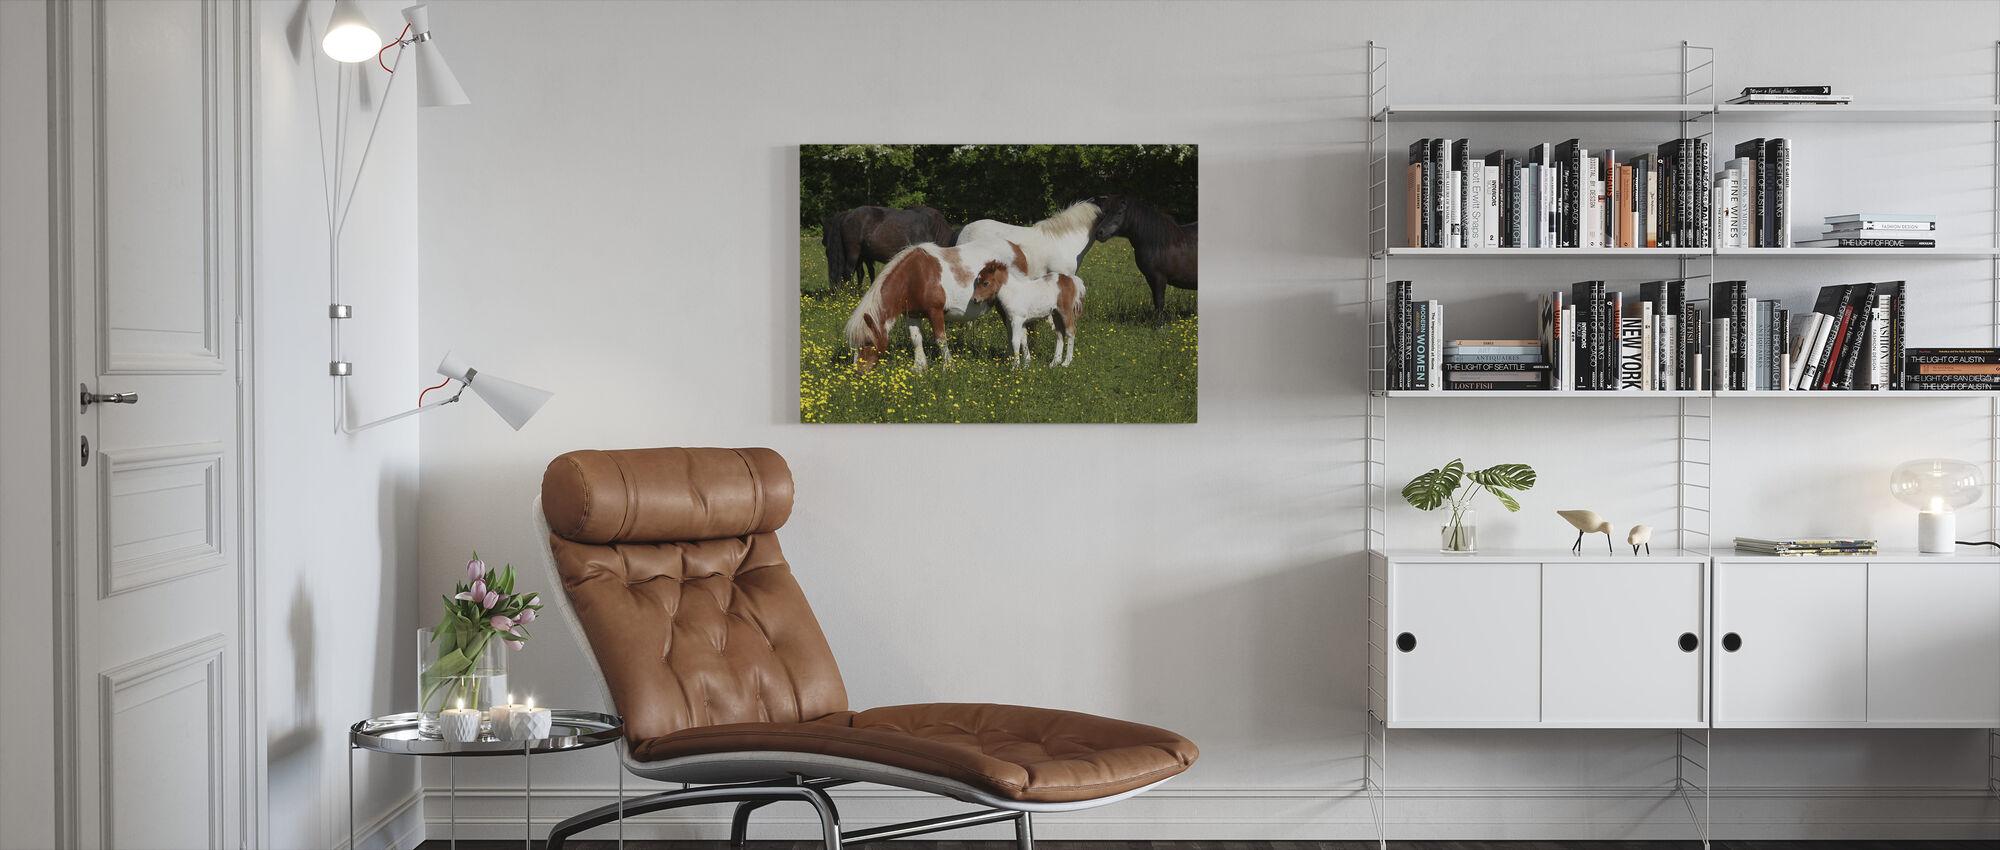 Shetlandponys - Leinwandbild - Wohnzimmer